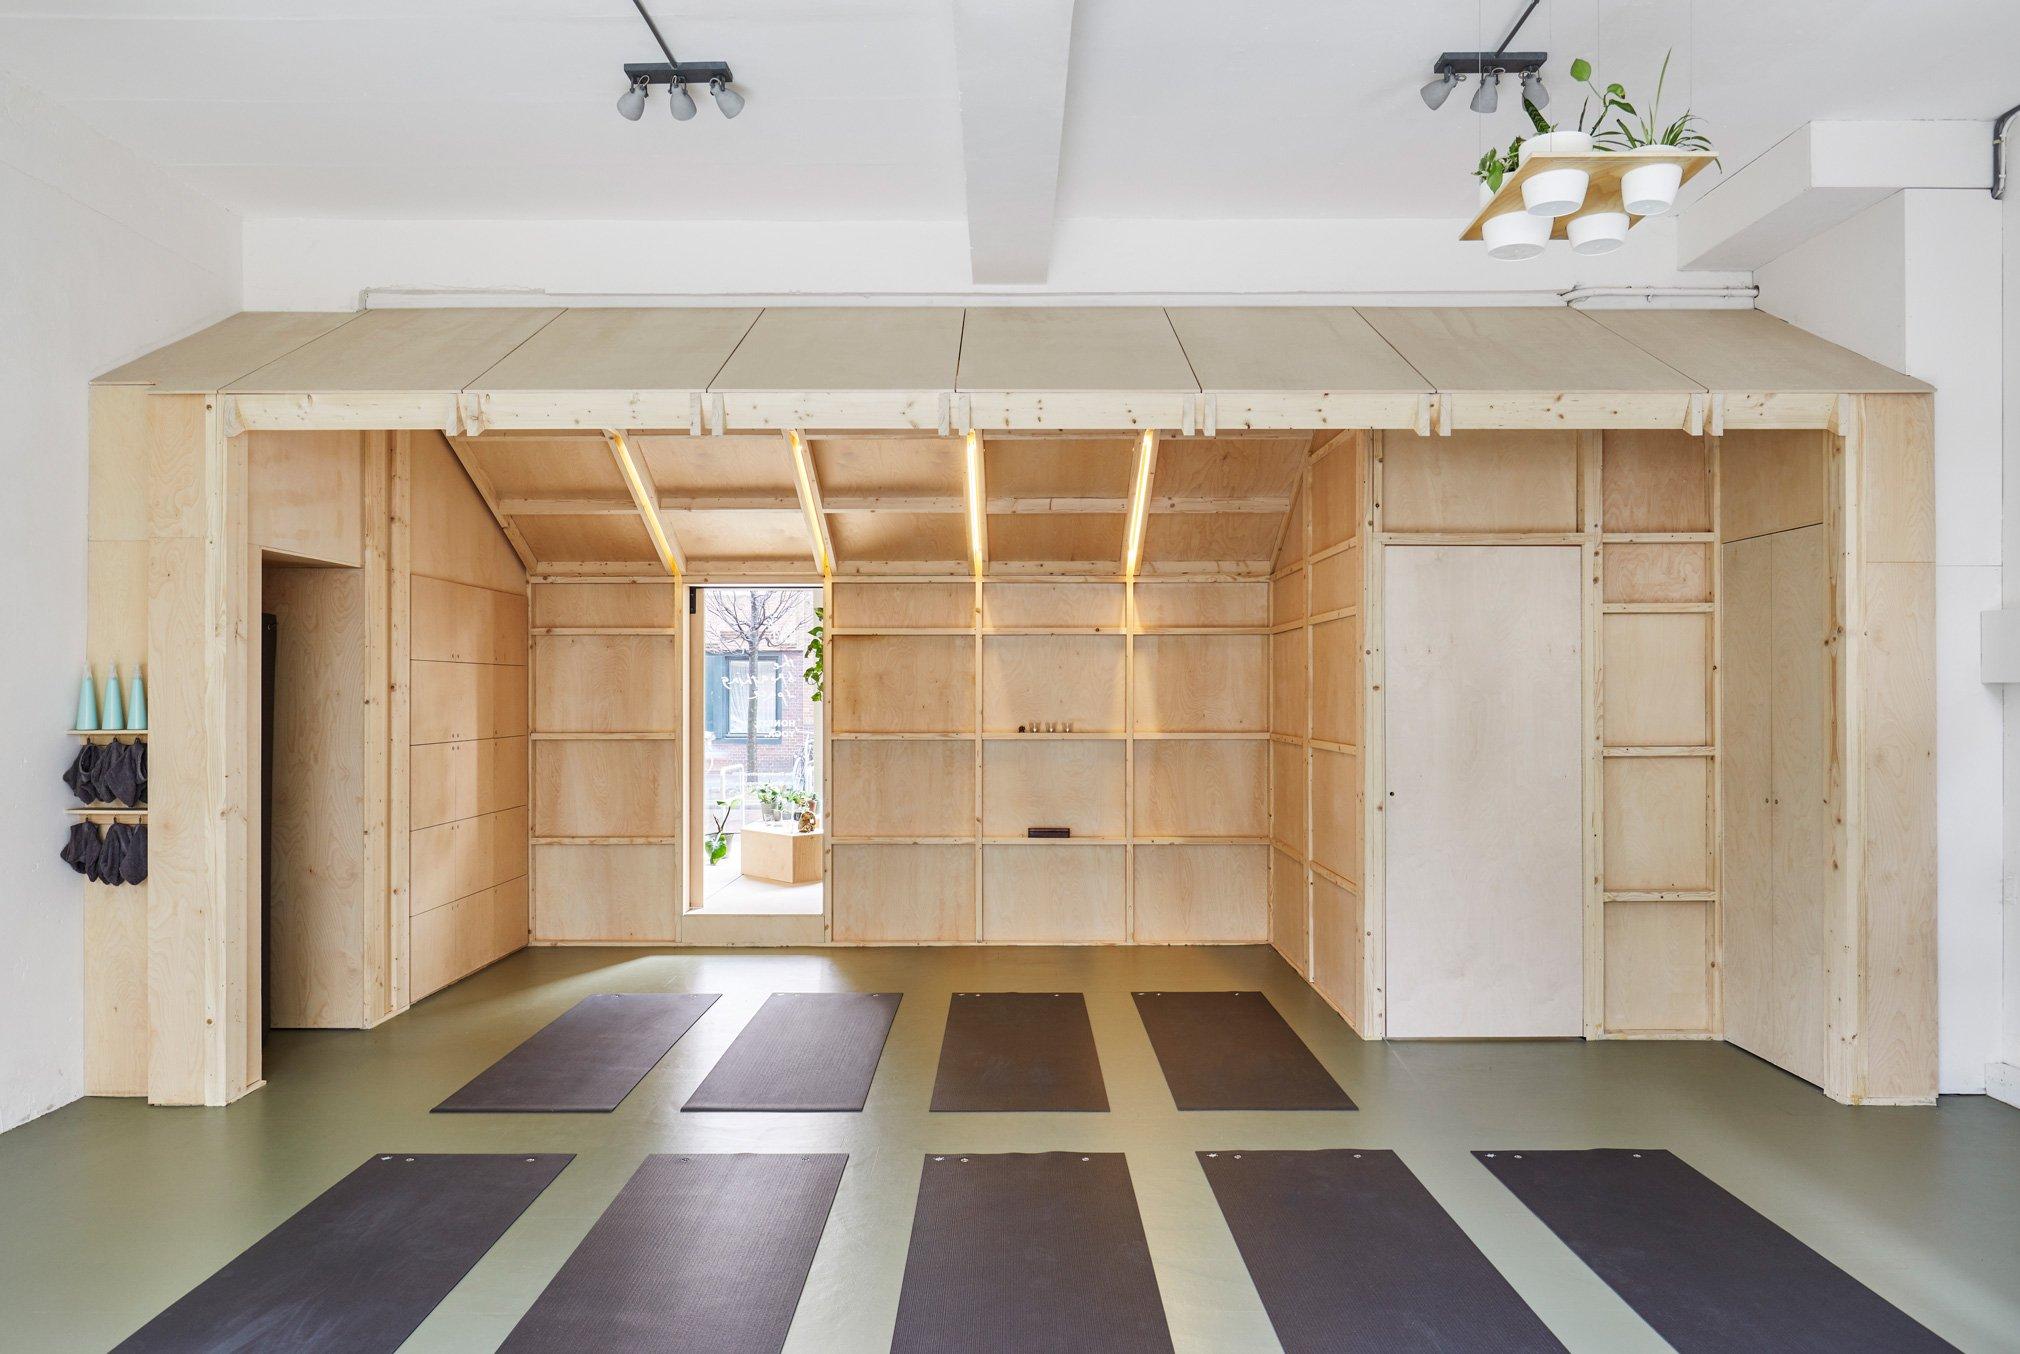 The Breathing Space Yoga Studio Simon Bush King Architecture